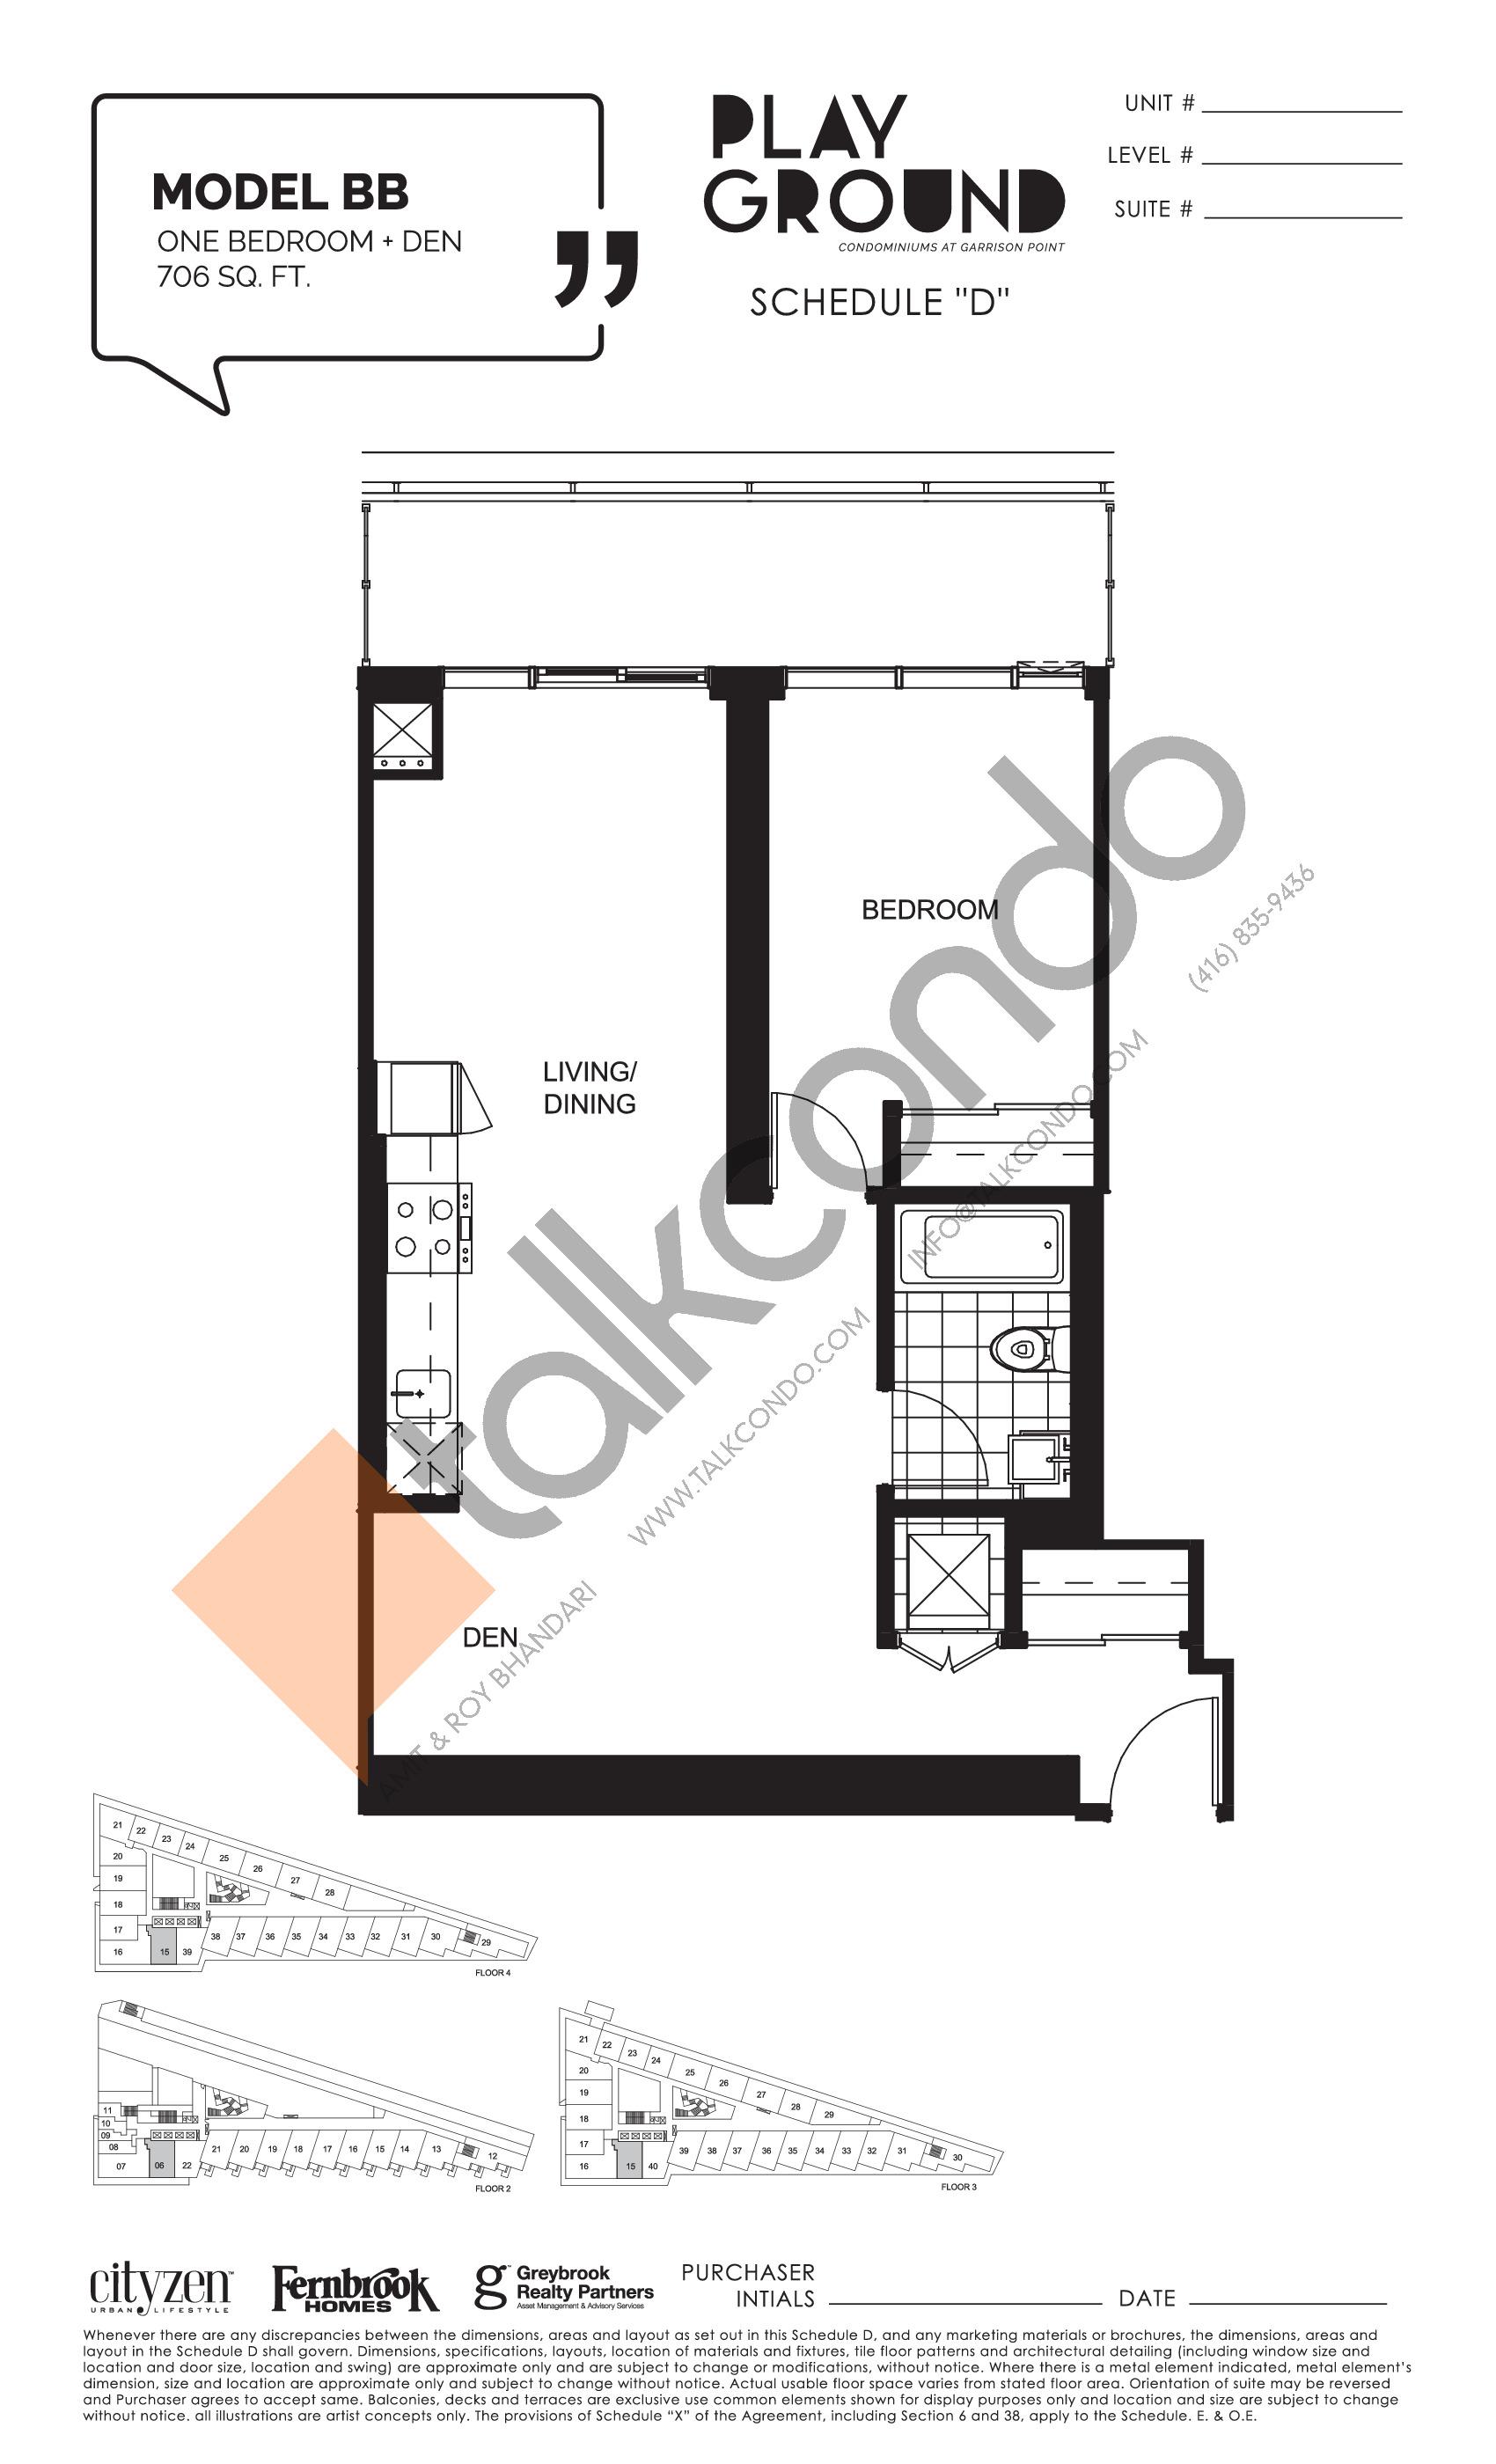 Model BB Floor Plan at Playground Condos at Garrison Point - 706 sq.ft